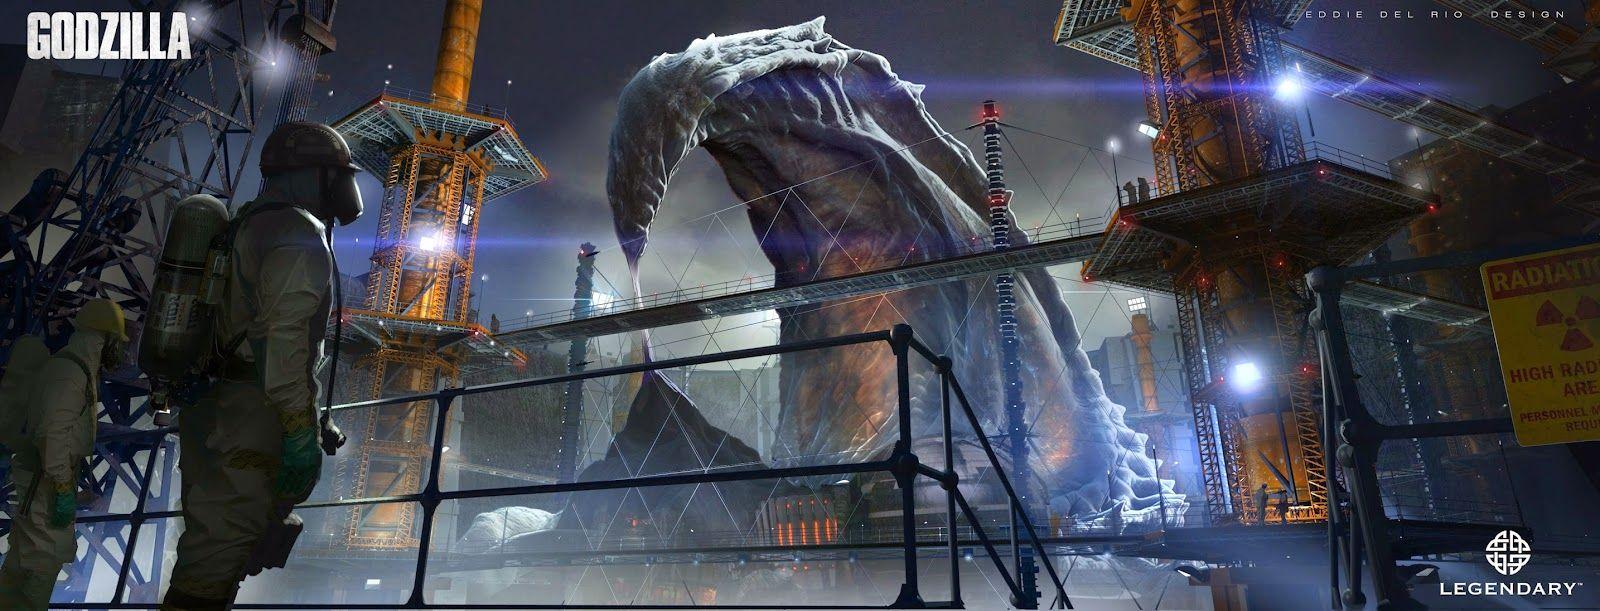 Godzilla concept